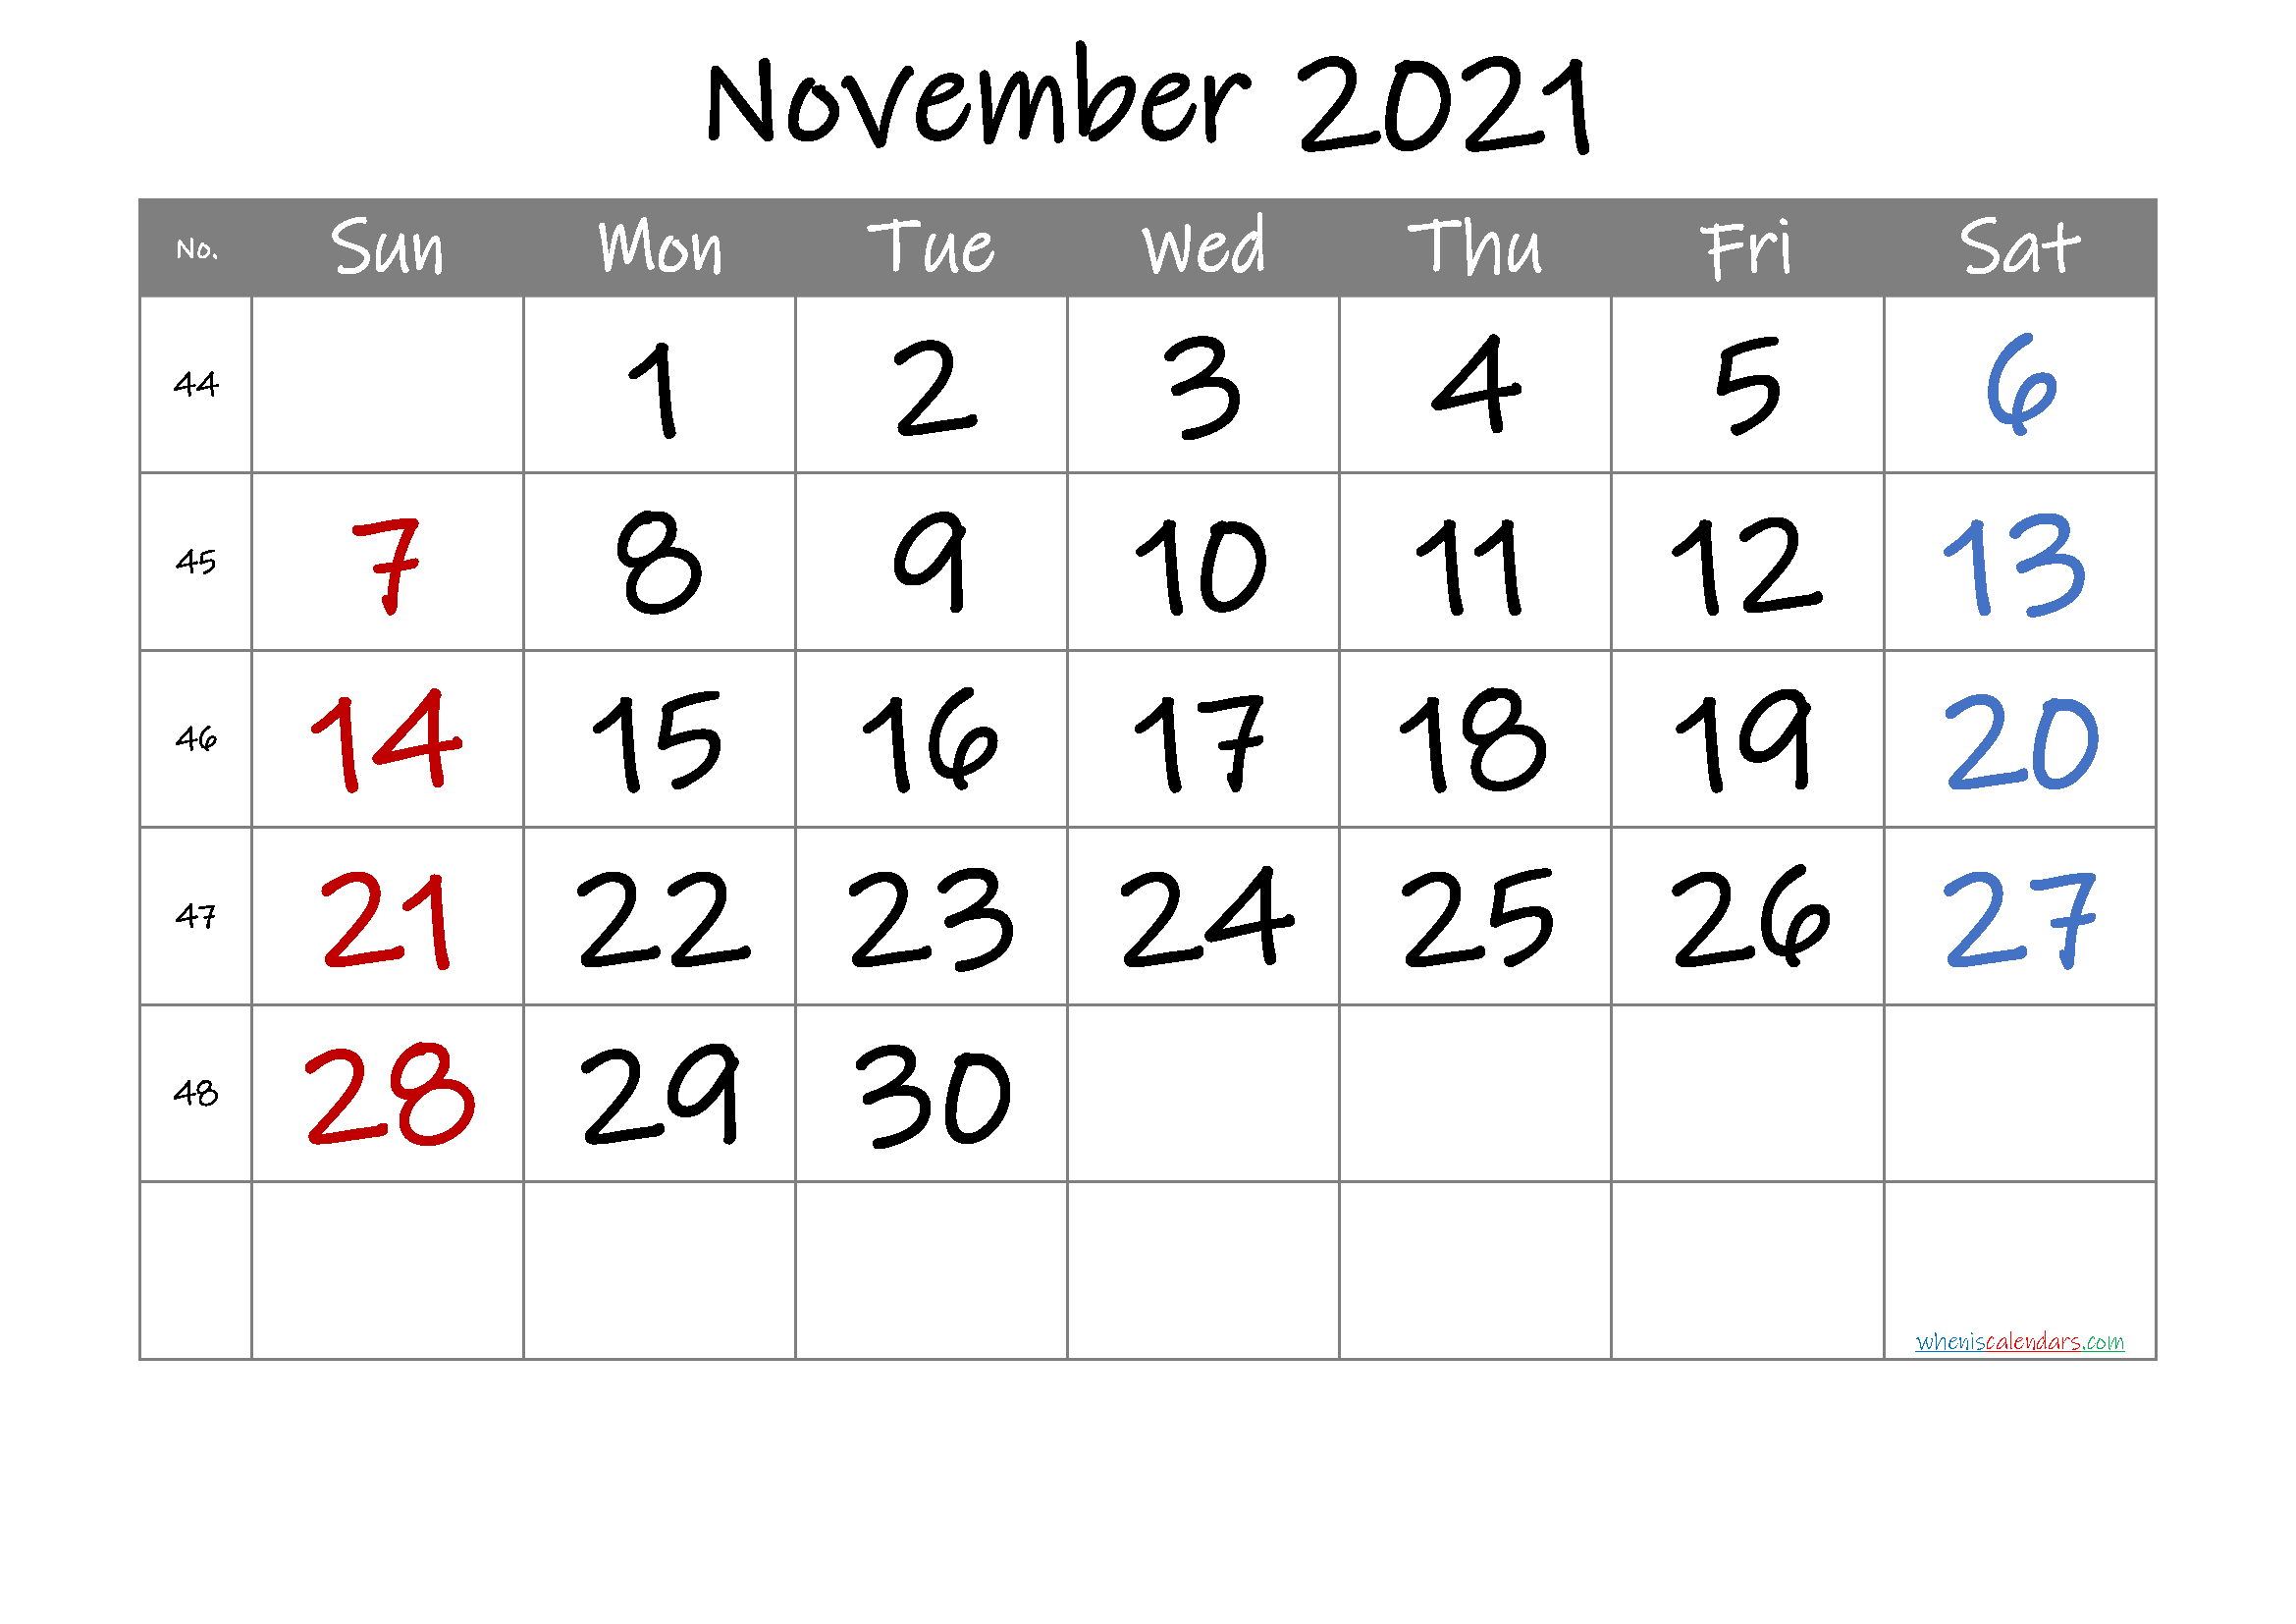 2021 November Free Printable Calendar Free Premium In 2020 Printable Calendar Template Calendar Printables 2021 Calendar